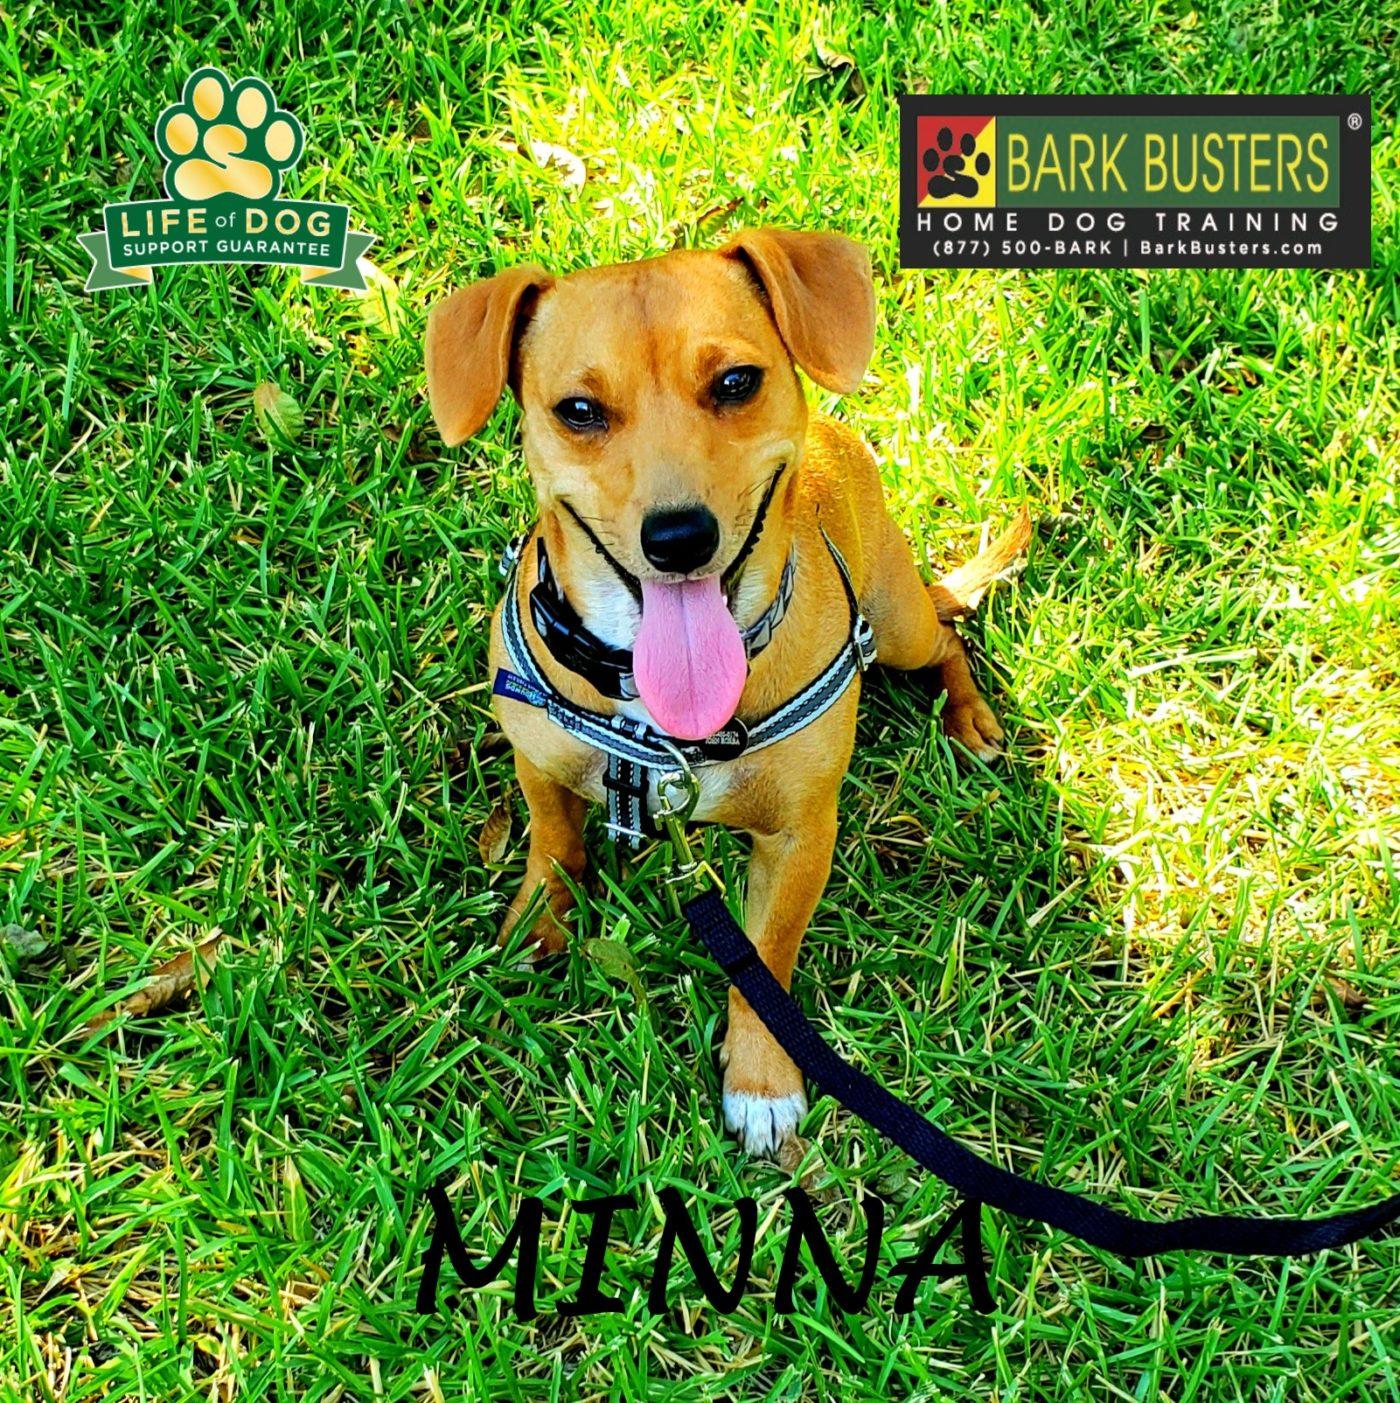 #chihuahua #beagle #mixeddog #dogtrainingaustin #dogtrainernearme #aggression #leashmanners #barkbusters #speakdog #inhomedogtraining